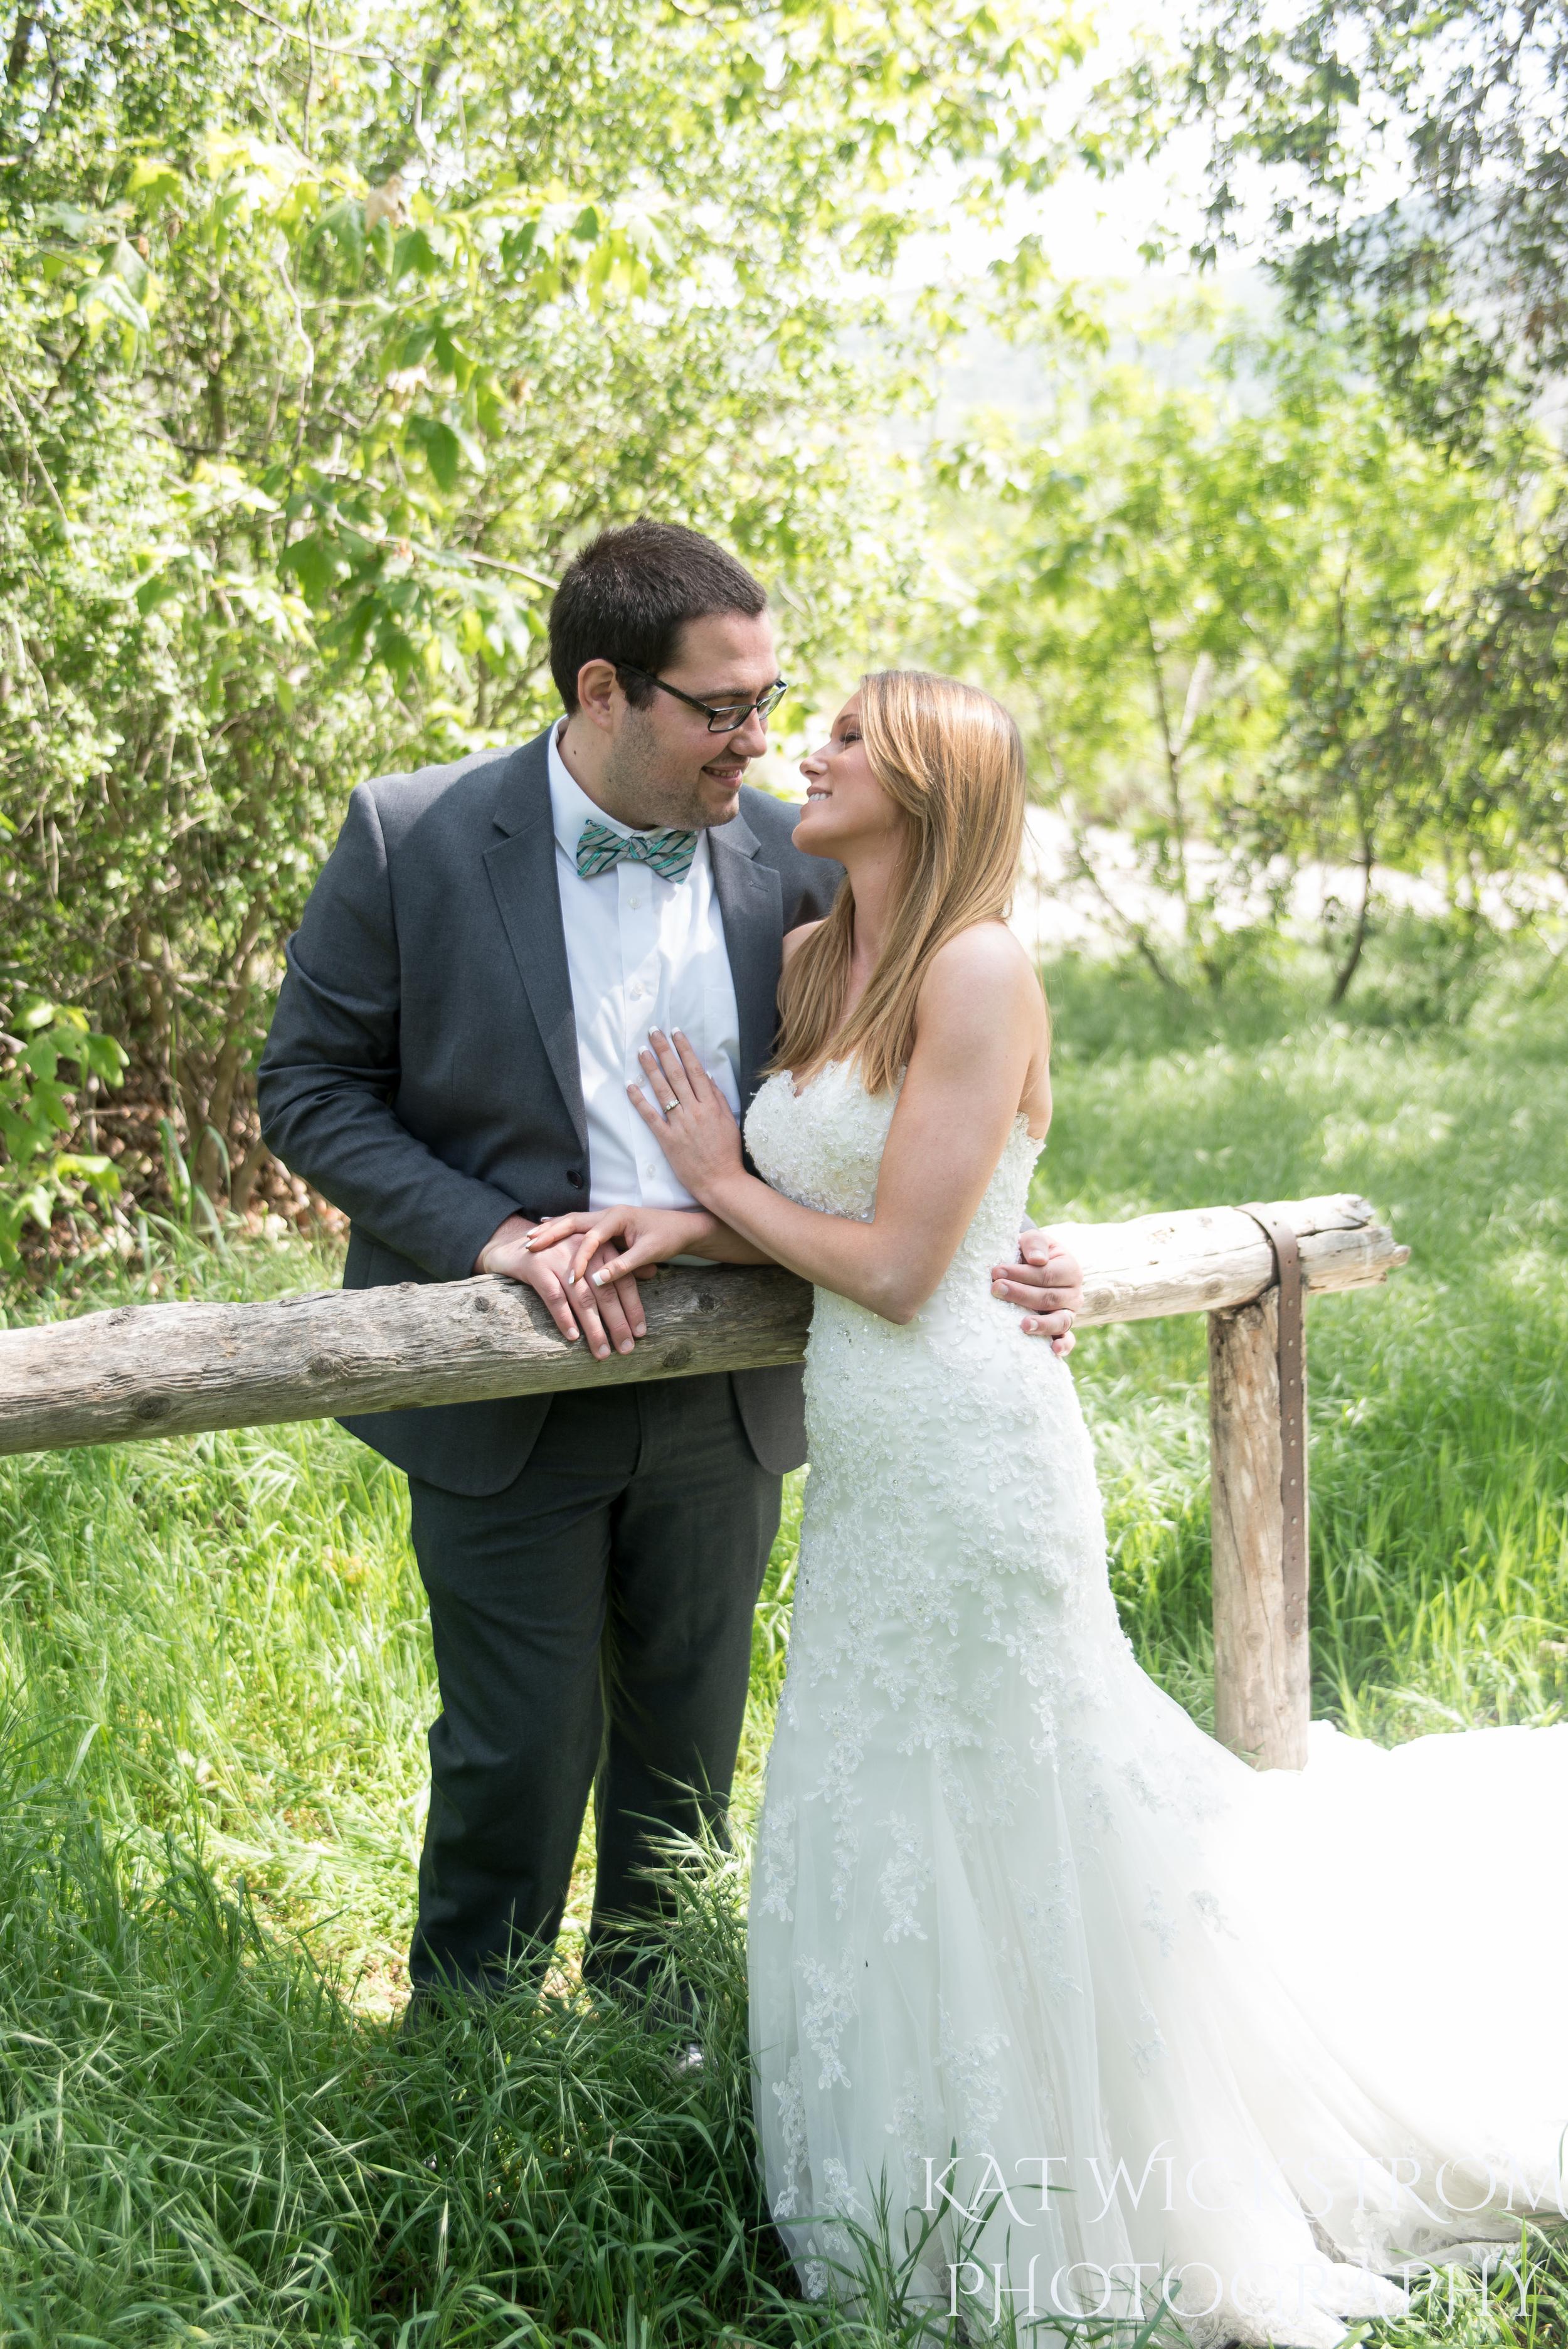 Rustic Solstice Canyon Malibu Wedding Bride and Groom